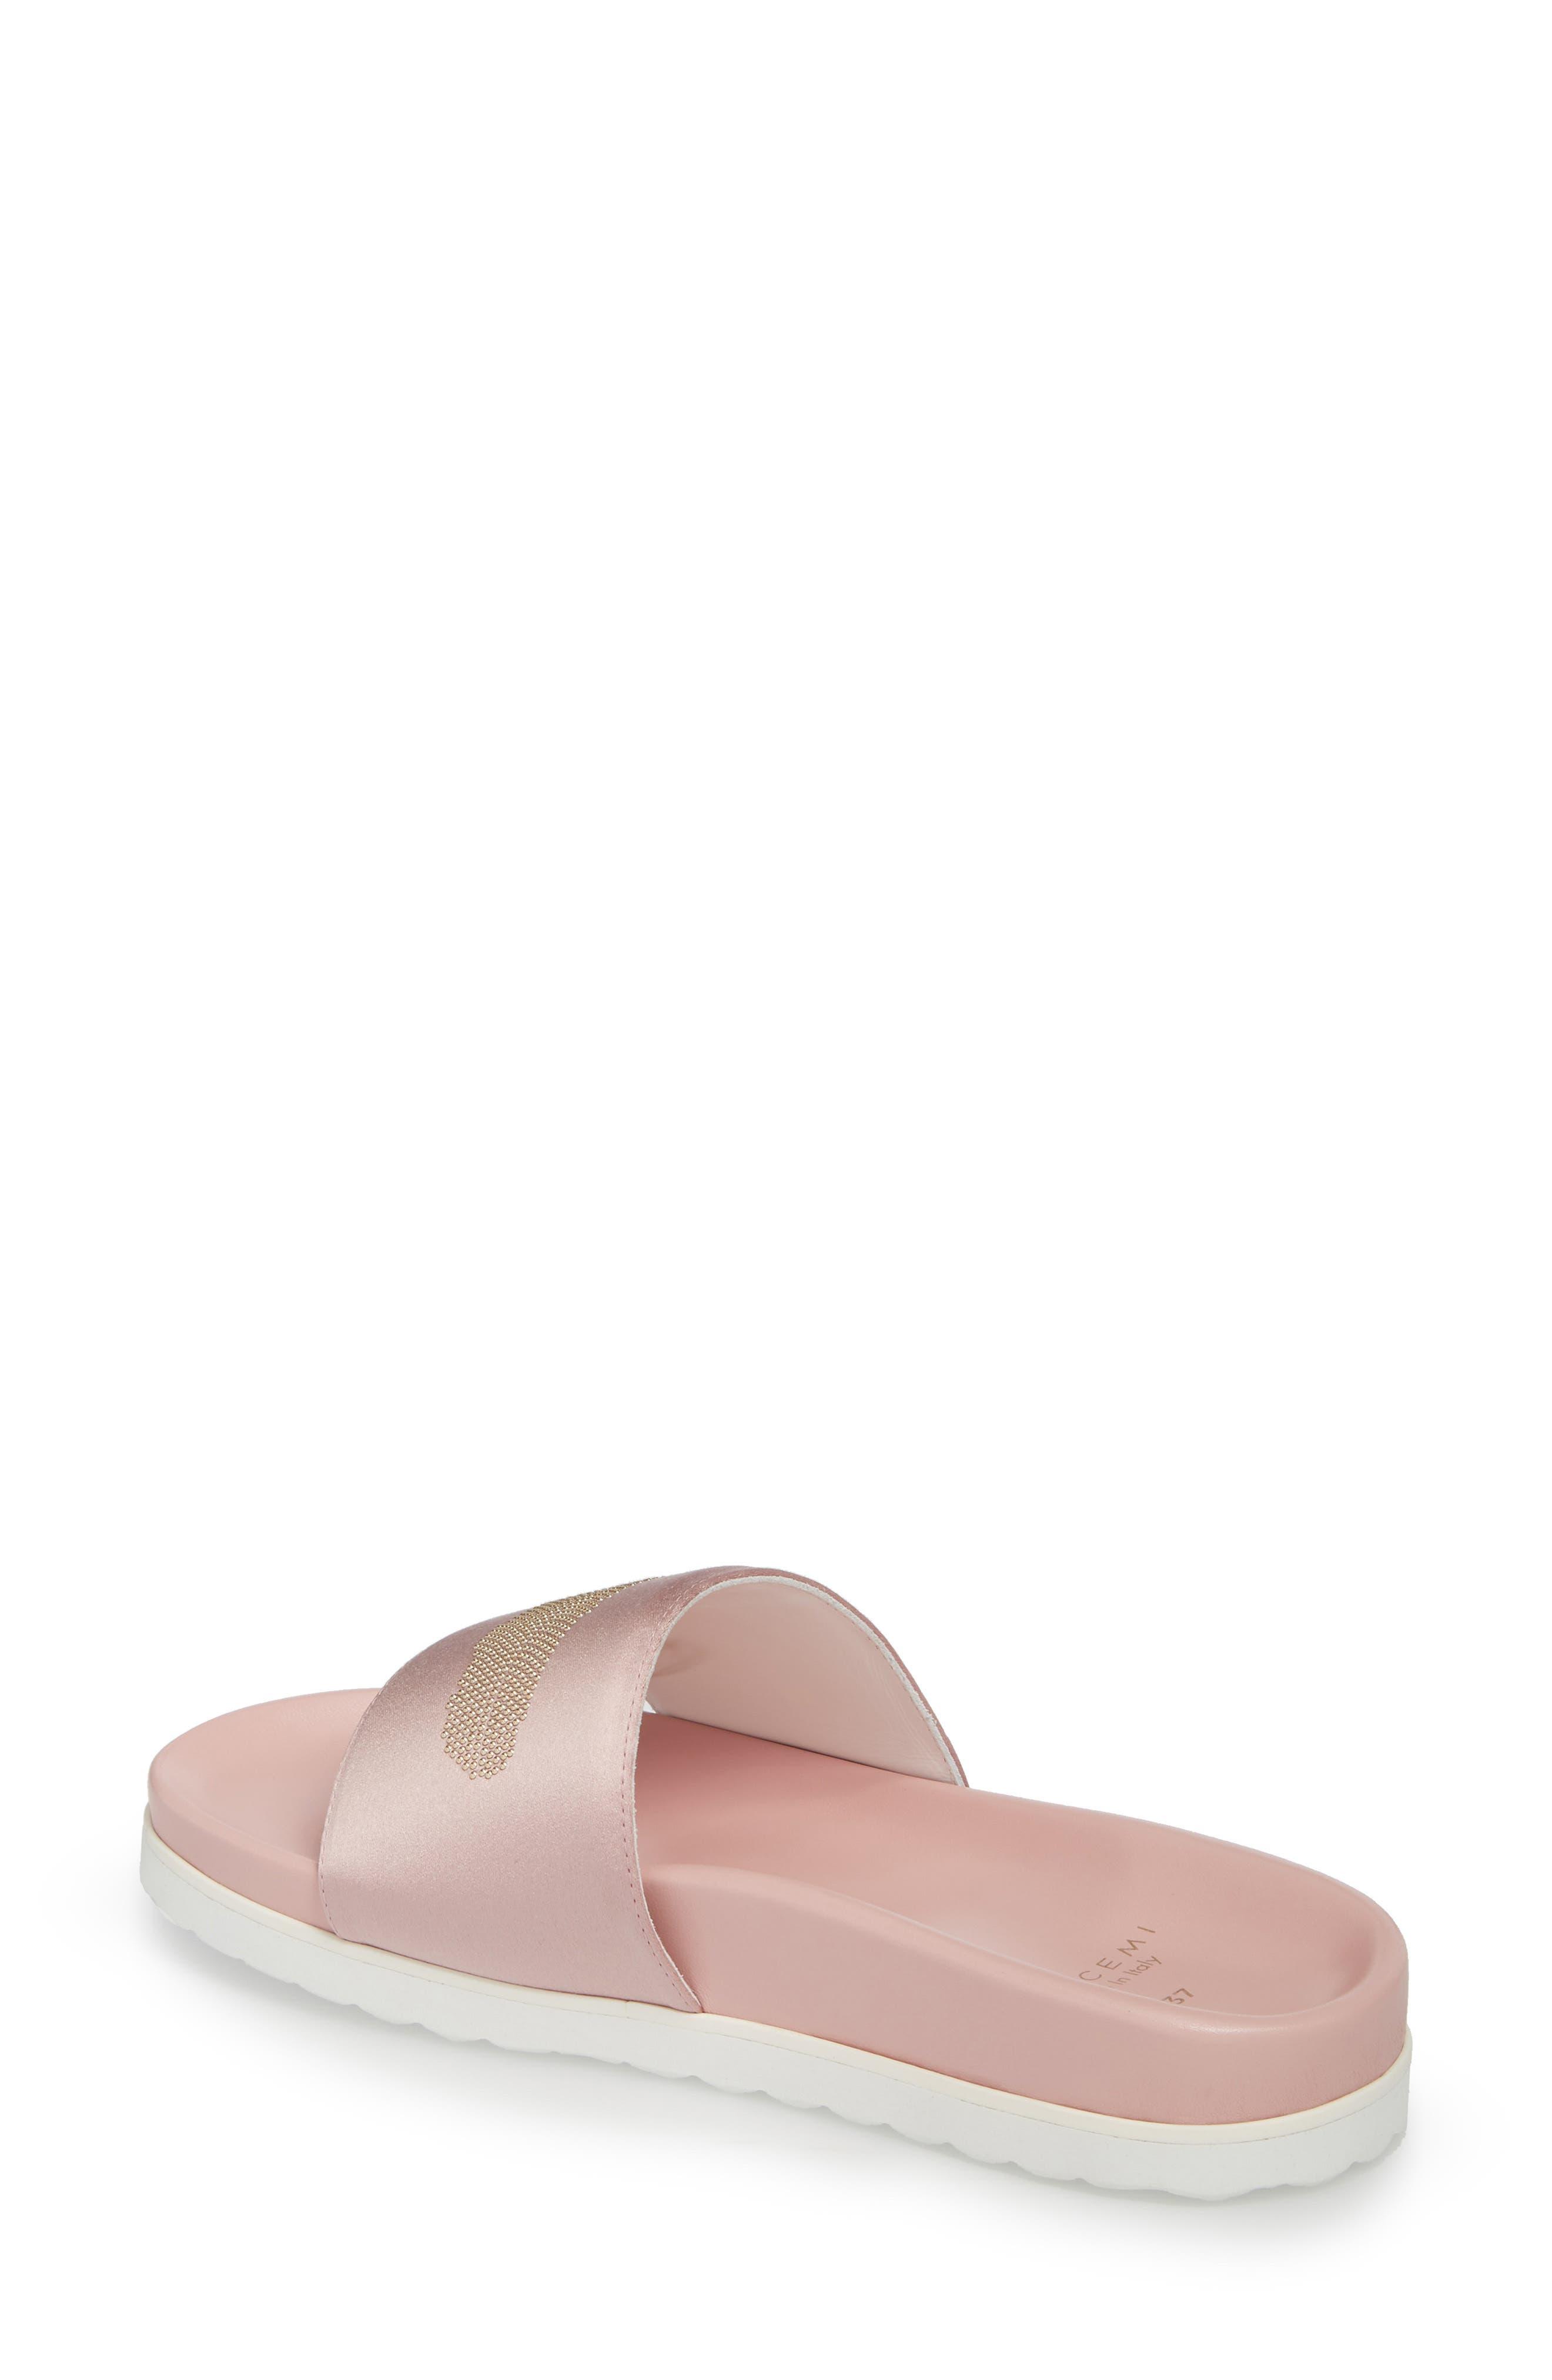 Satin Slide Sandal,                             Alternate thumbnail 2, color,                             Pink